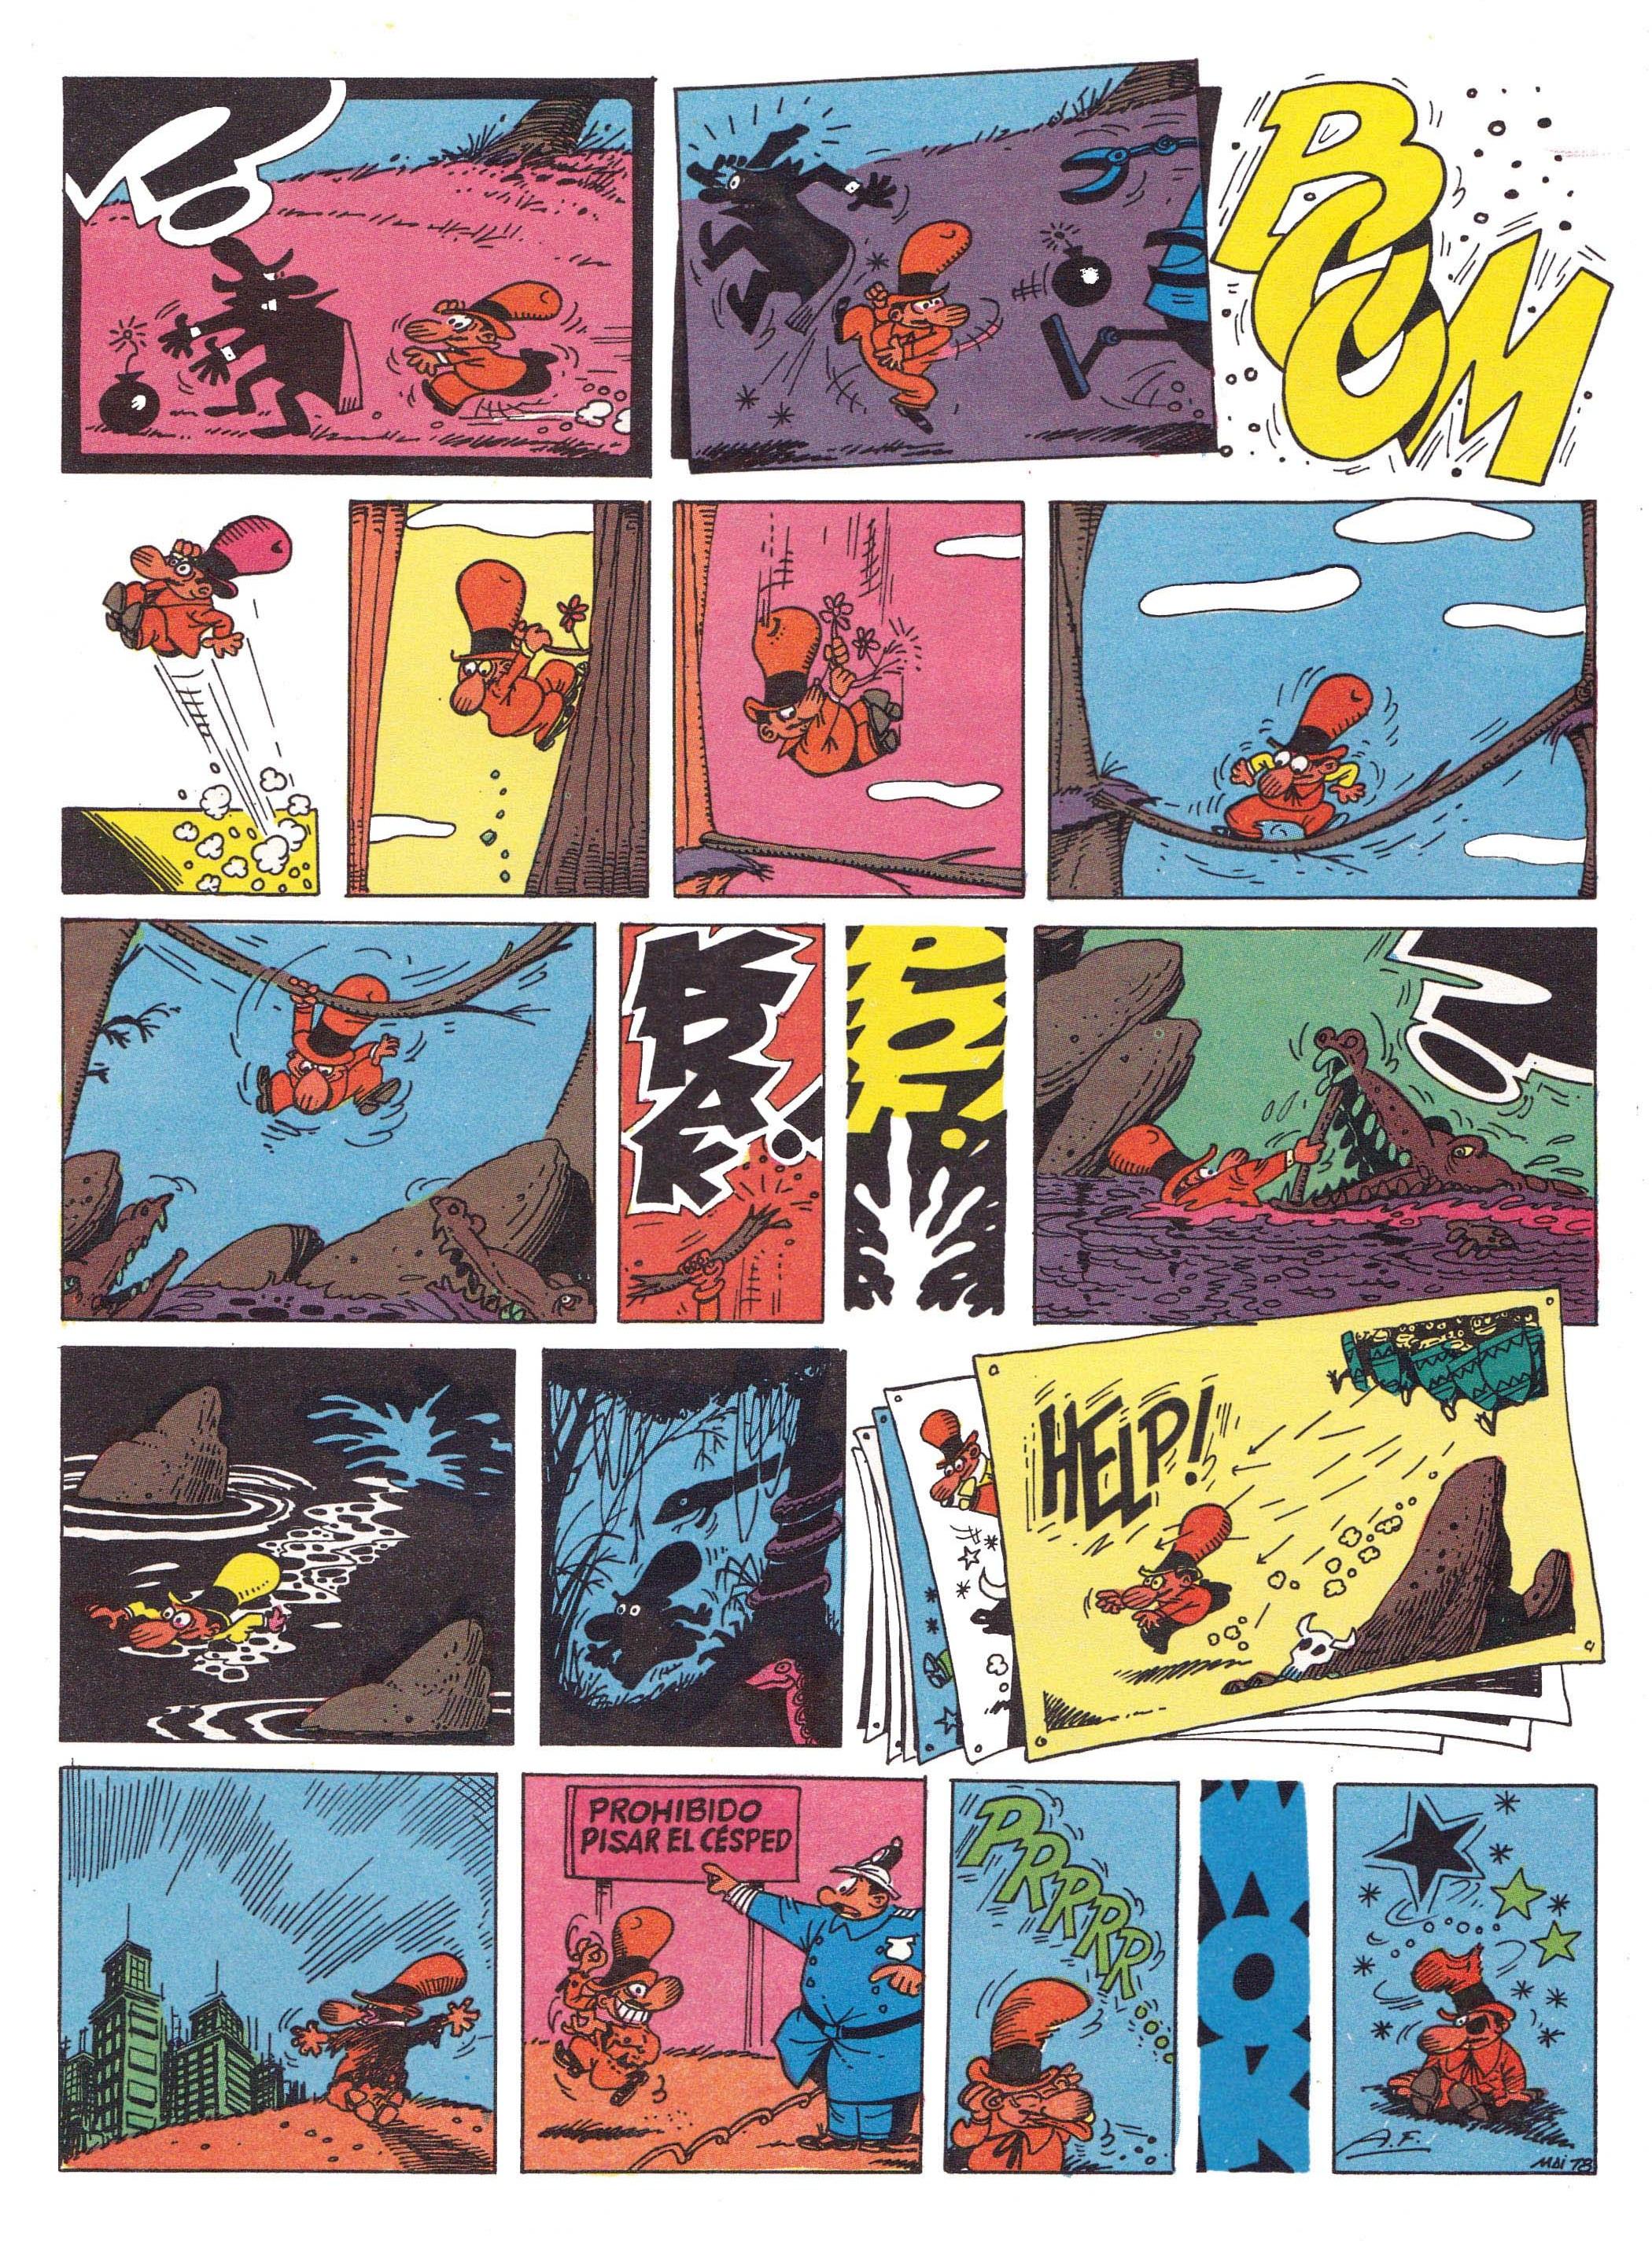 """Don Terrible Buñuelos"" from  Super Rompetechos , 1978, reprinted in  Colección Olé , 1991."